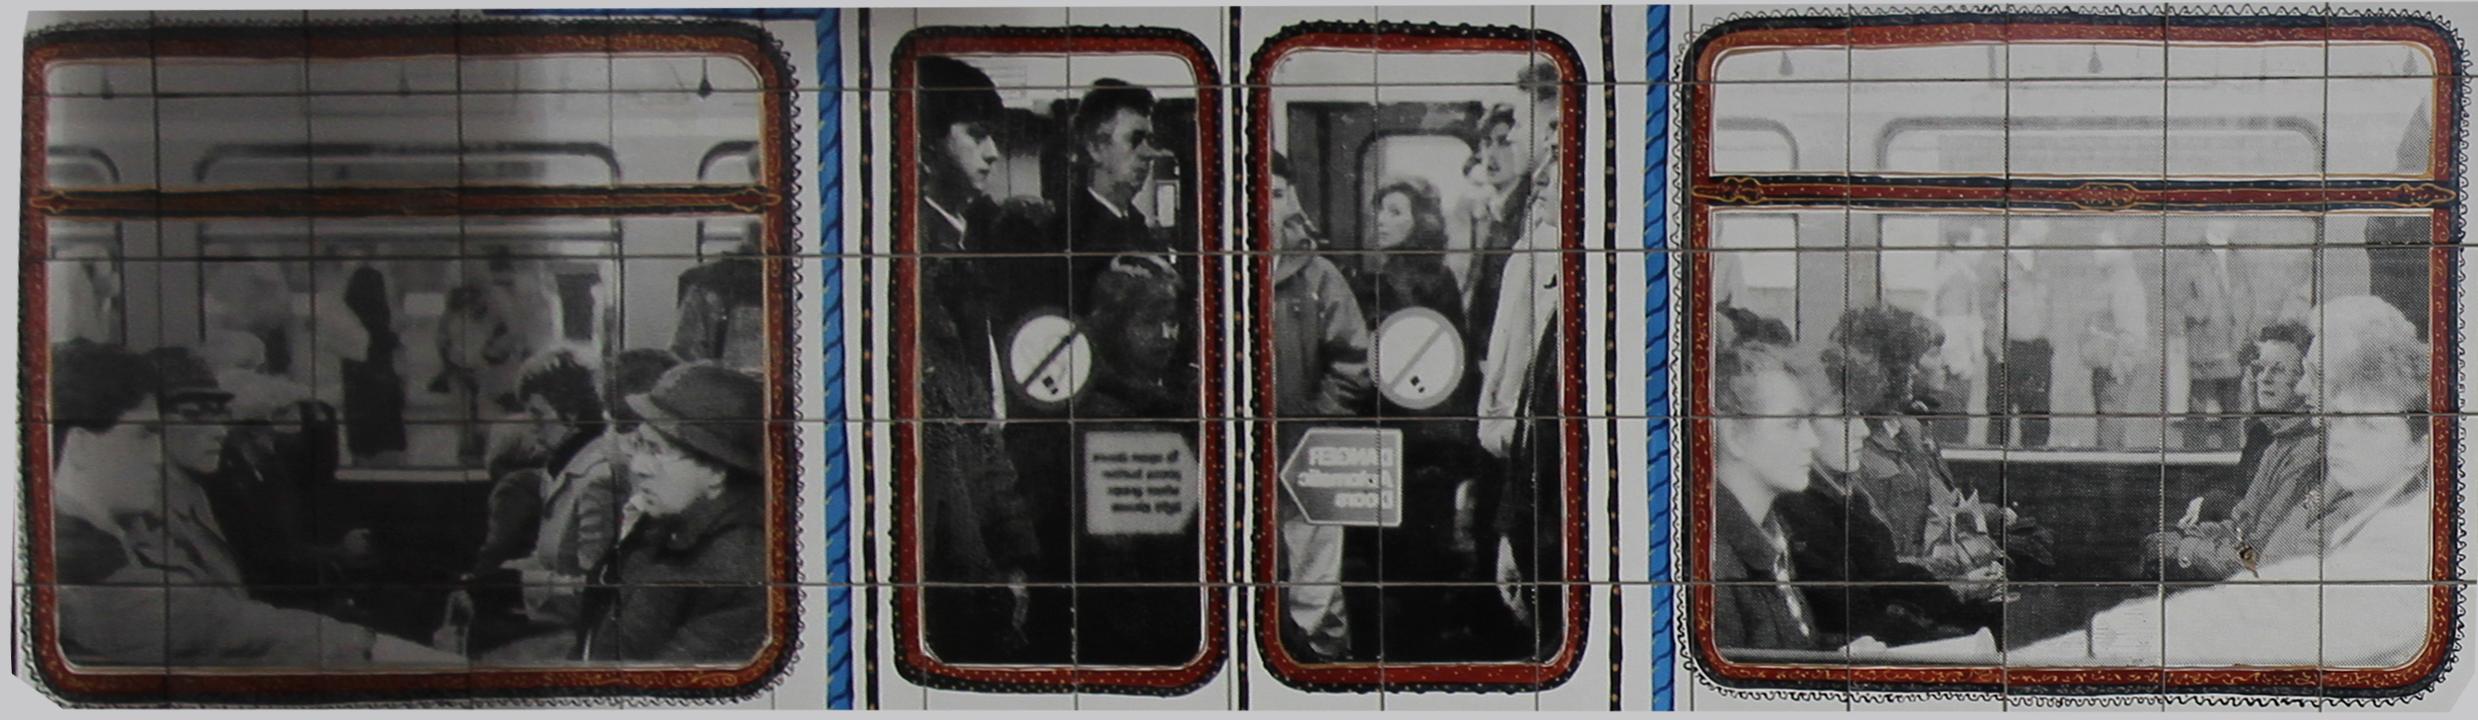 Fenstern Metro Mural